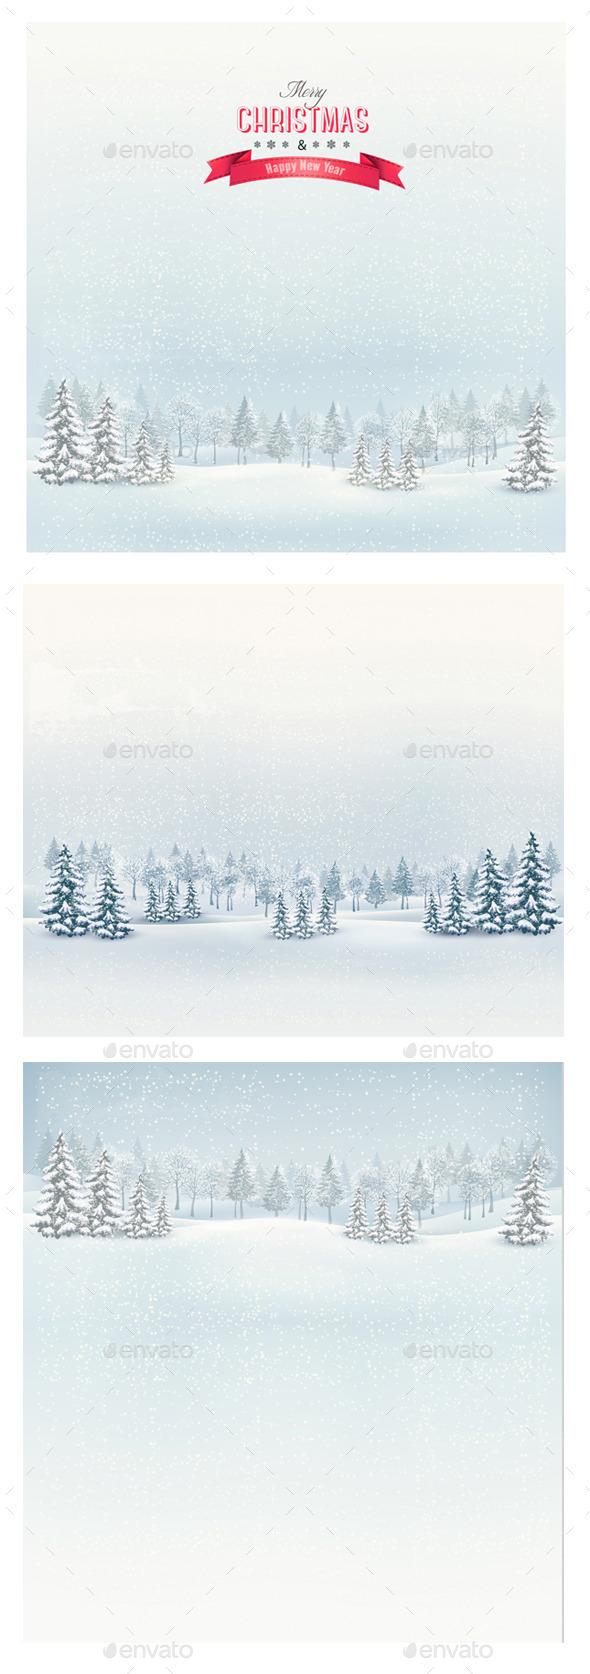 GraphicRiver Christmas Winter Landscape Backgrounds Bundle 9475449